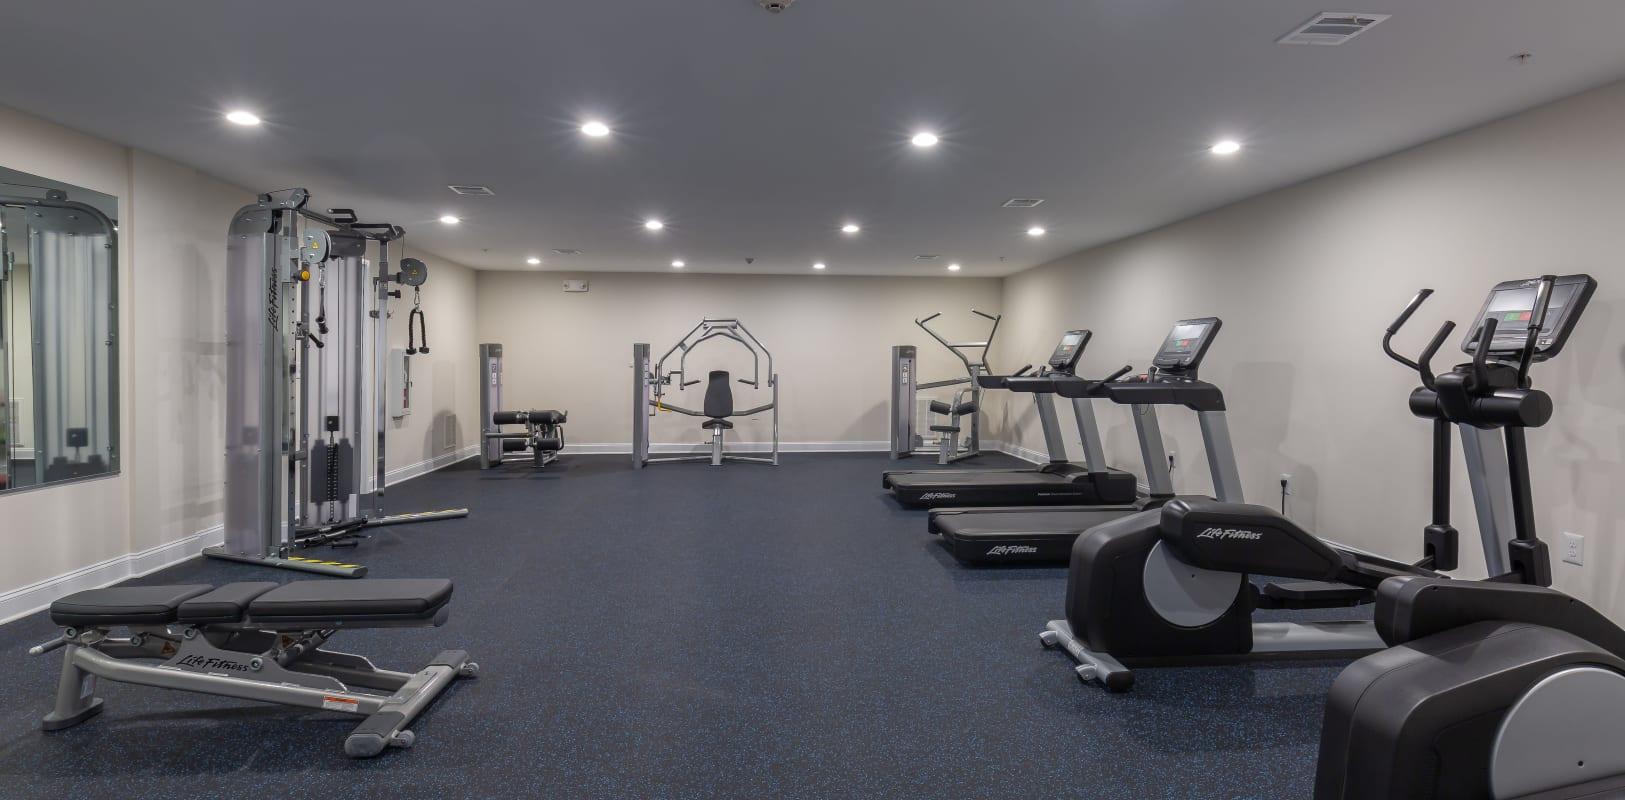 Fitness center at Zephyr Ridge in Cedar Grove, New Jersey